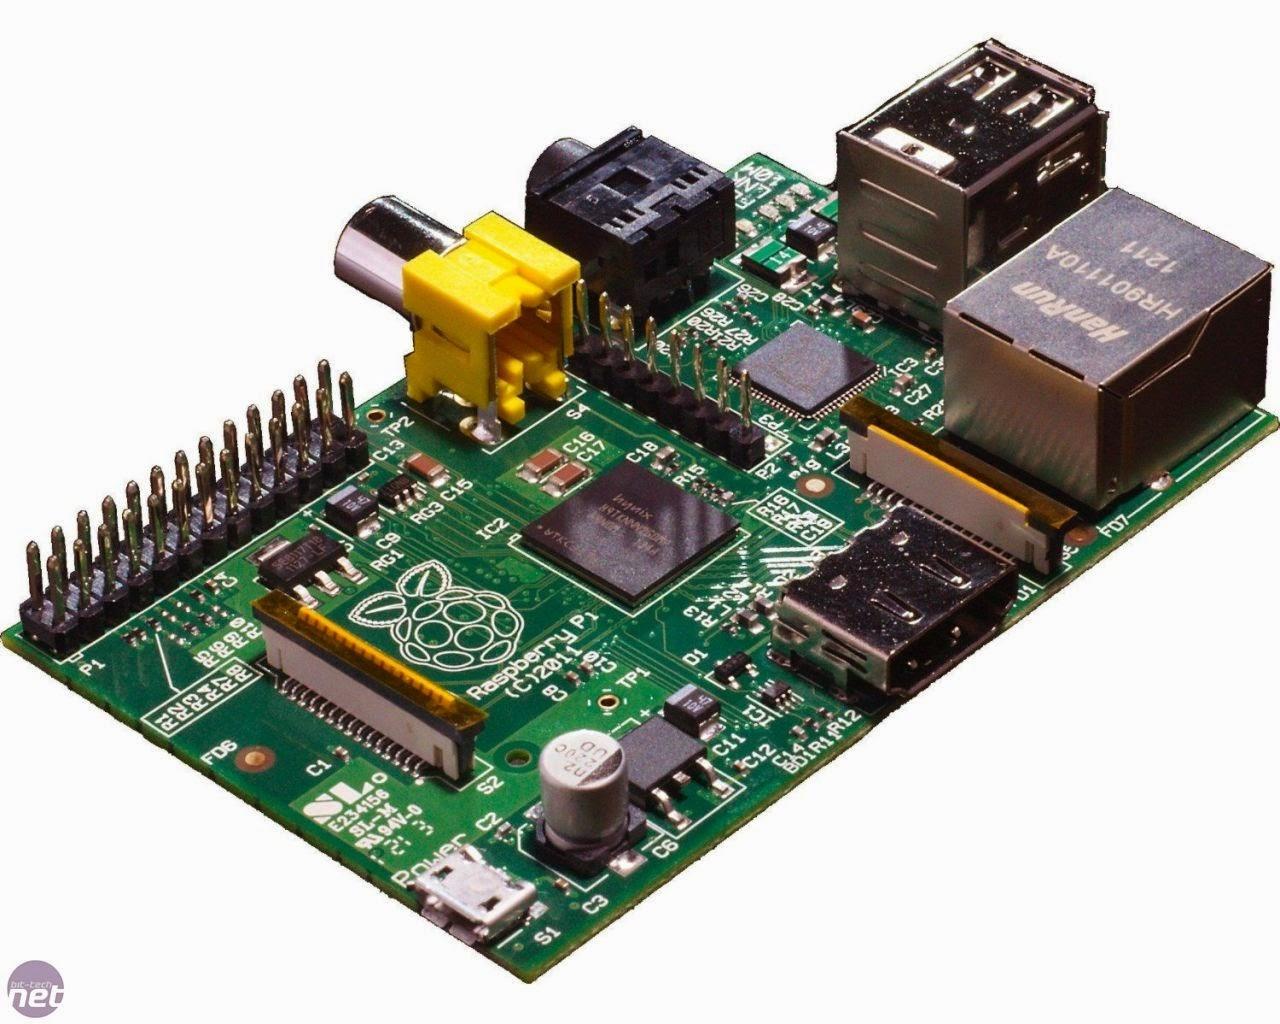 Xw0rkS Projects: Raspberry Pi Carputer project